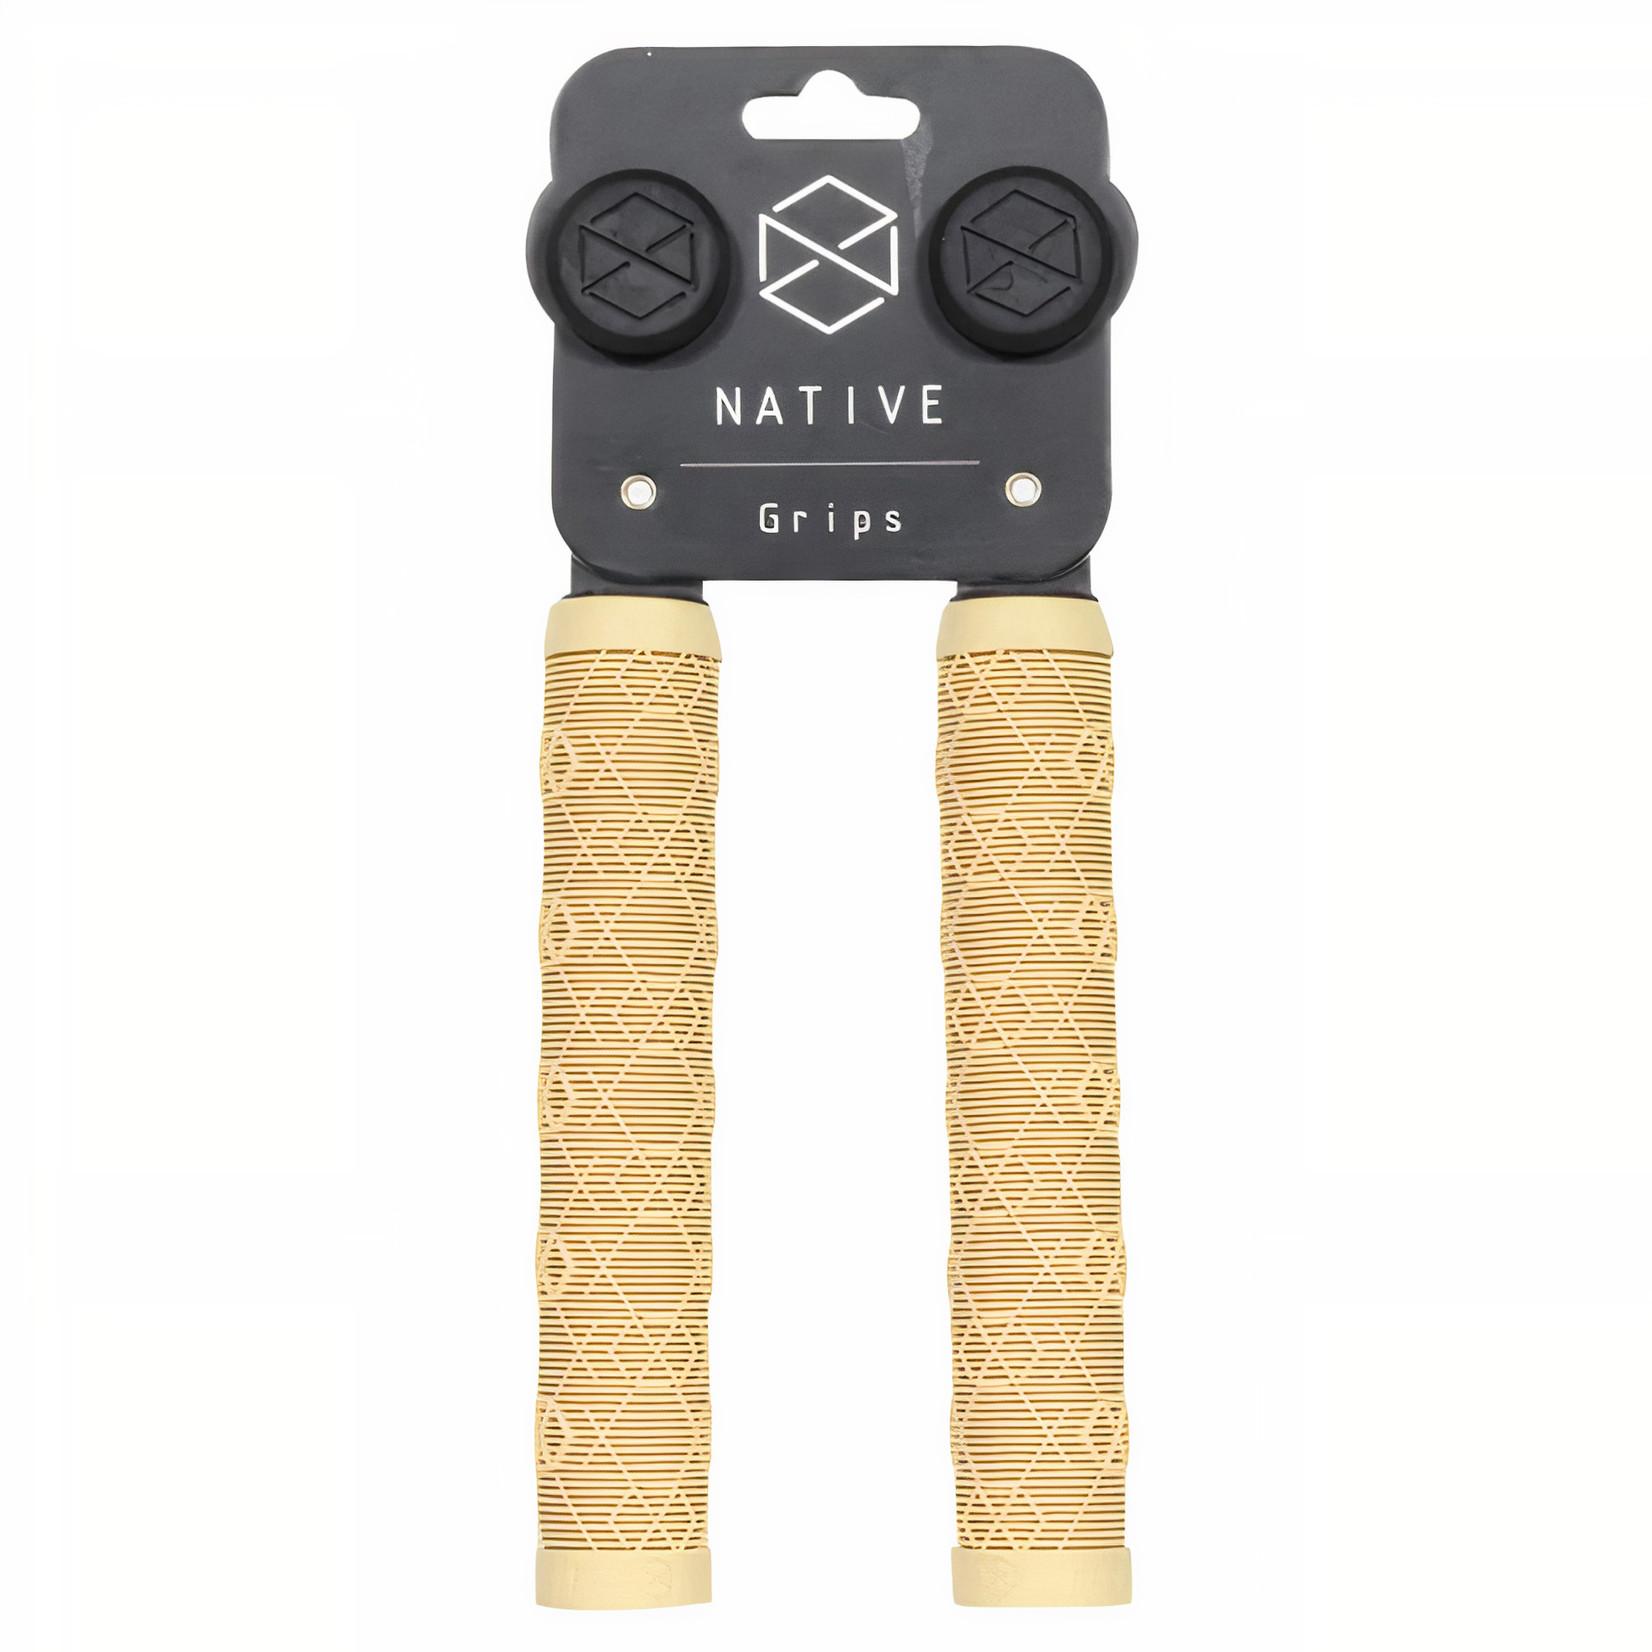 Native Native - Emblem Grips - Clay